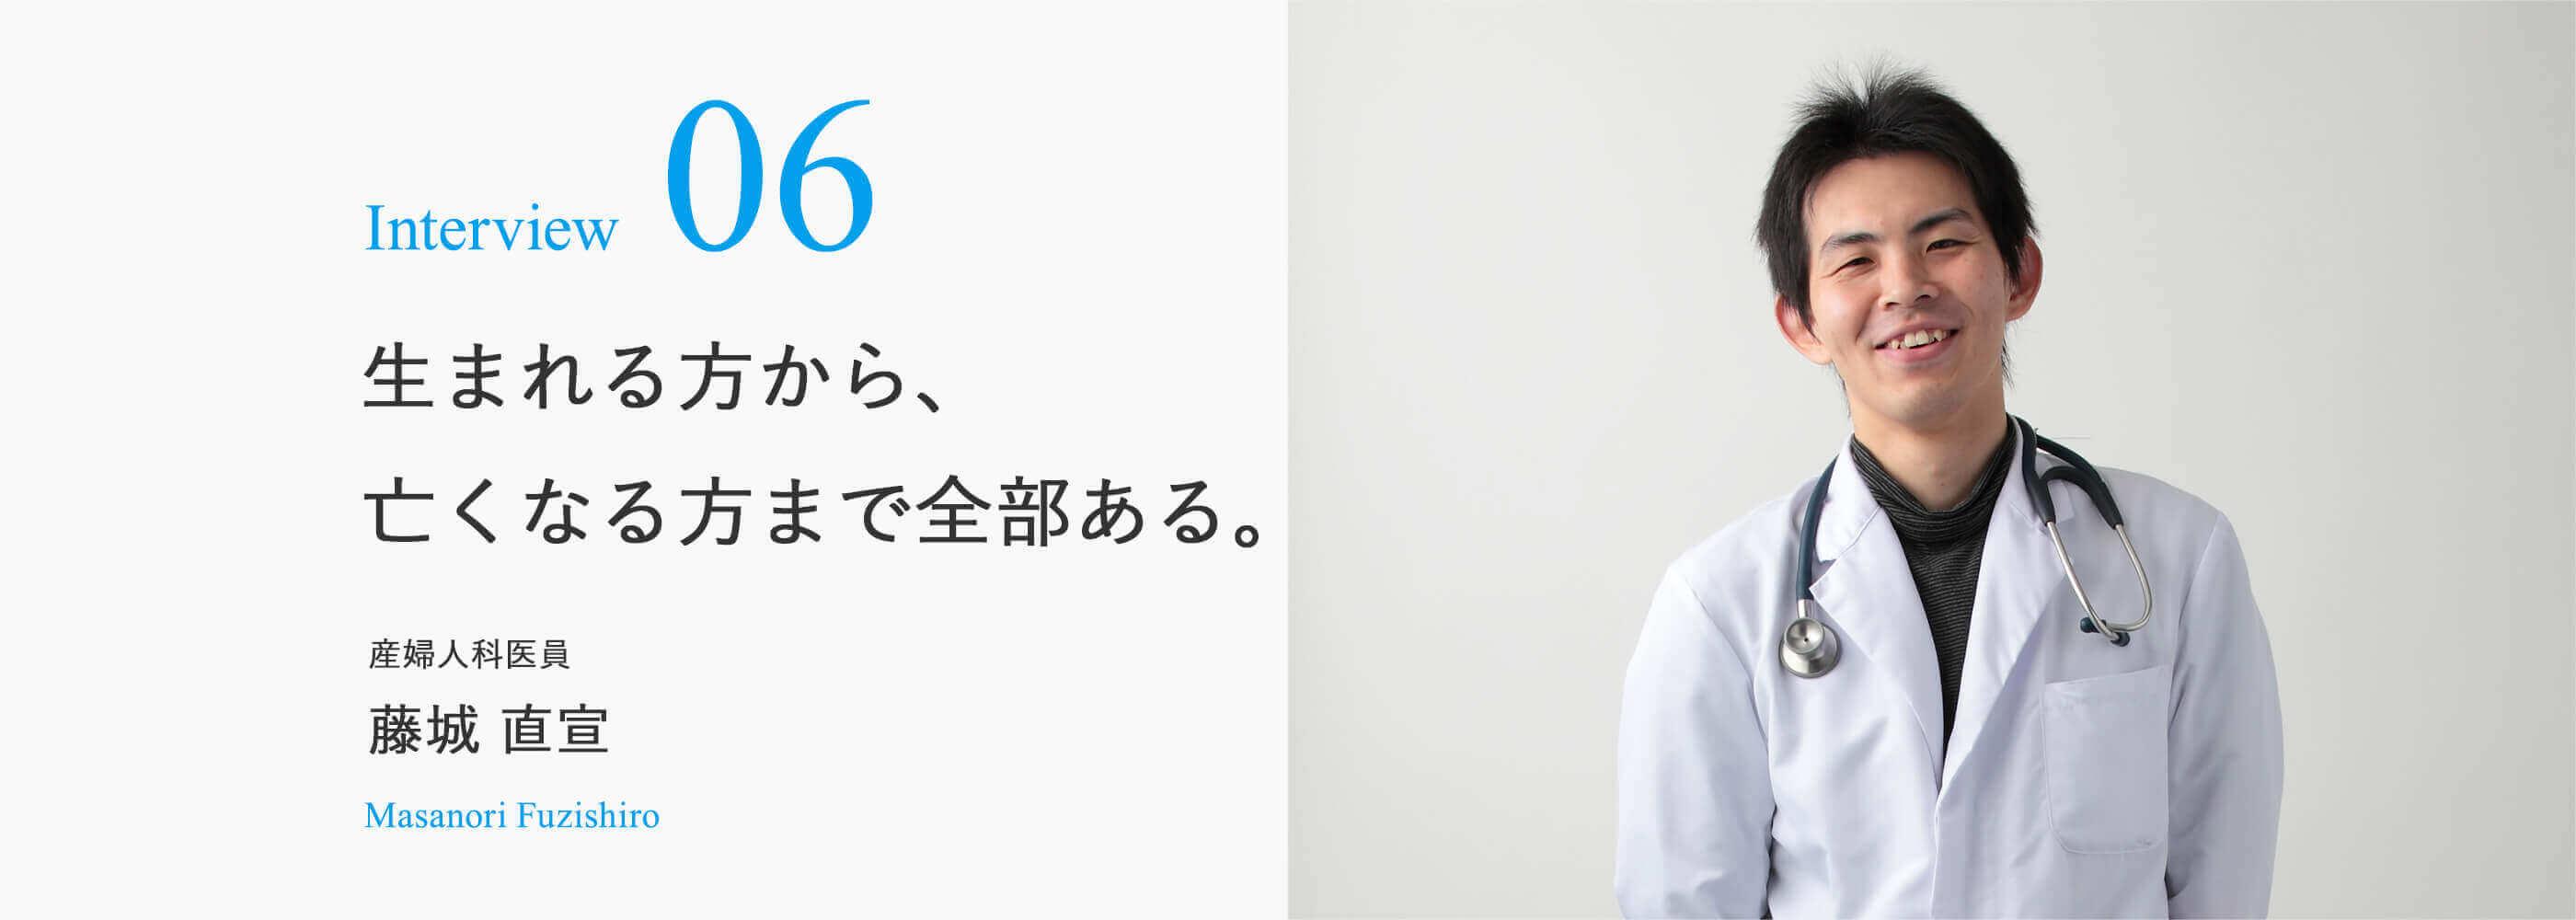 Interview 06 生まれる方から、亡くなる方まで全部ある。産婦人科医員 藤城 直宣